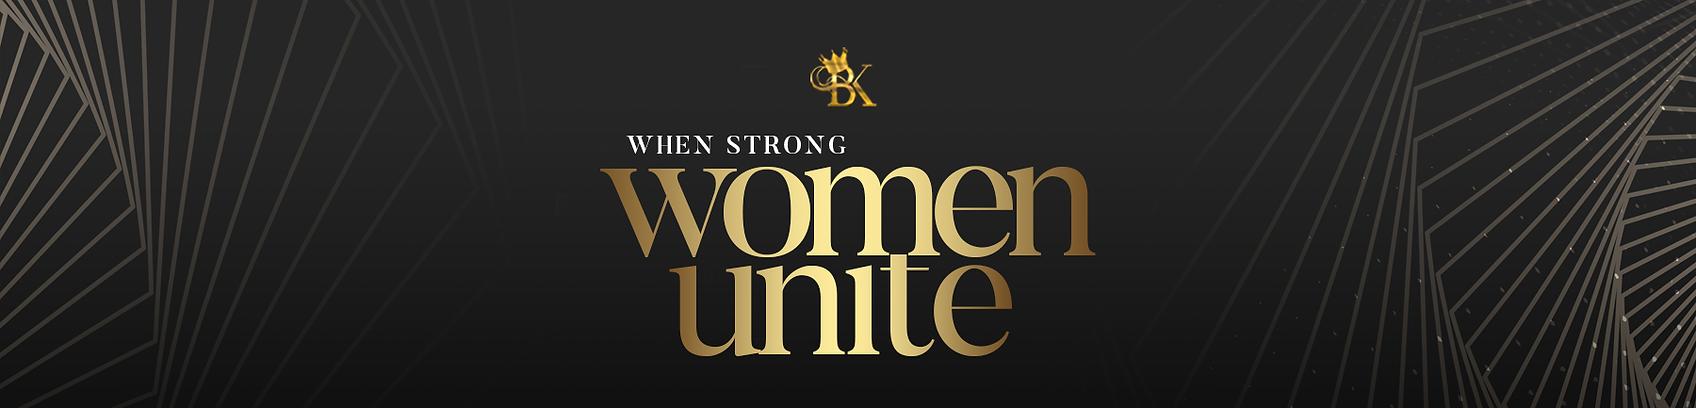 bkim when strong women unite.png